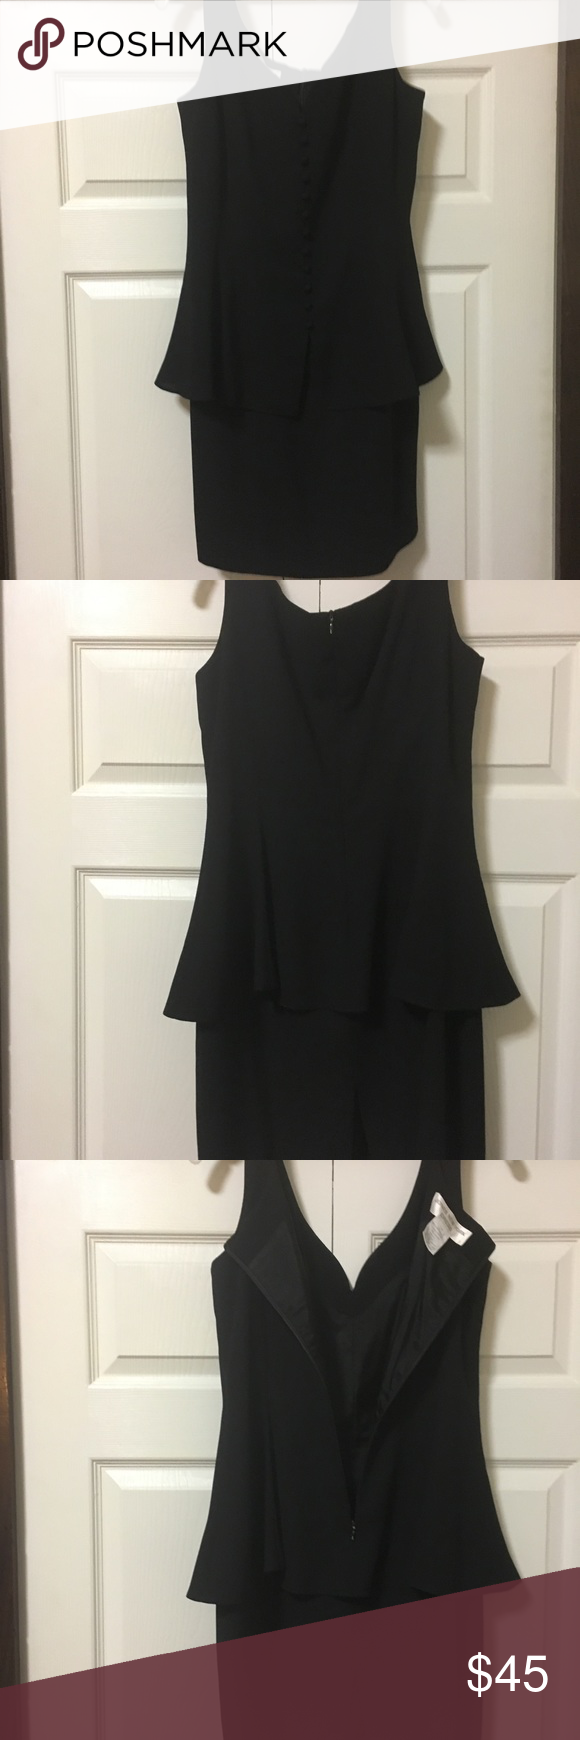 Jones New York Black Dress Size 12 Clothes Design Jones New York Black Dress [ 1740 x 580 Pixel ]